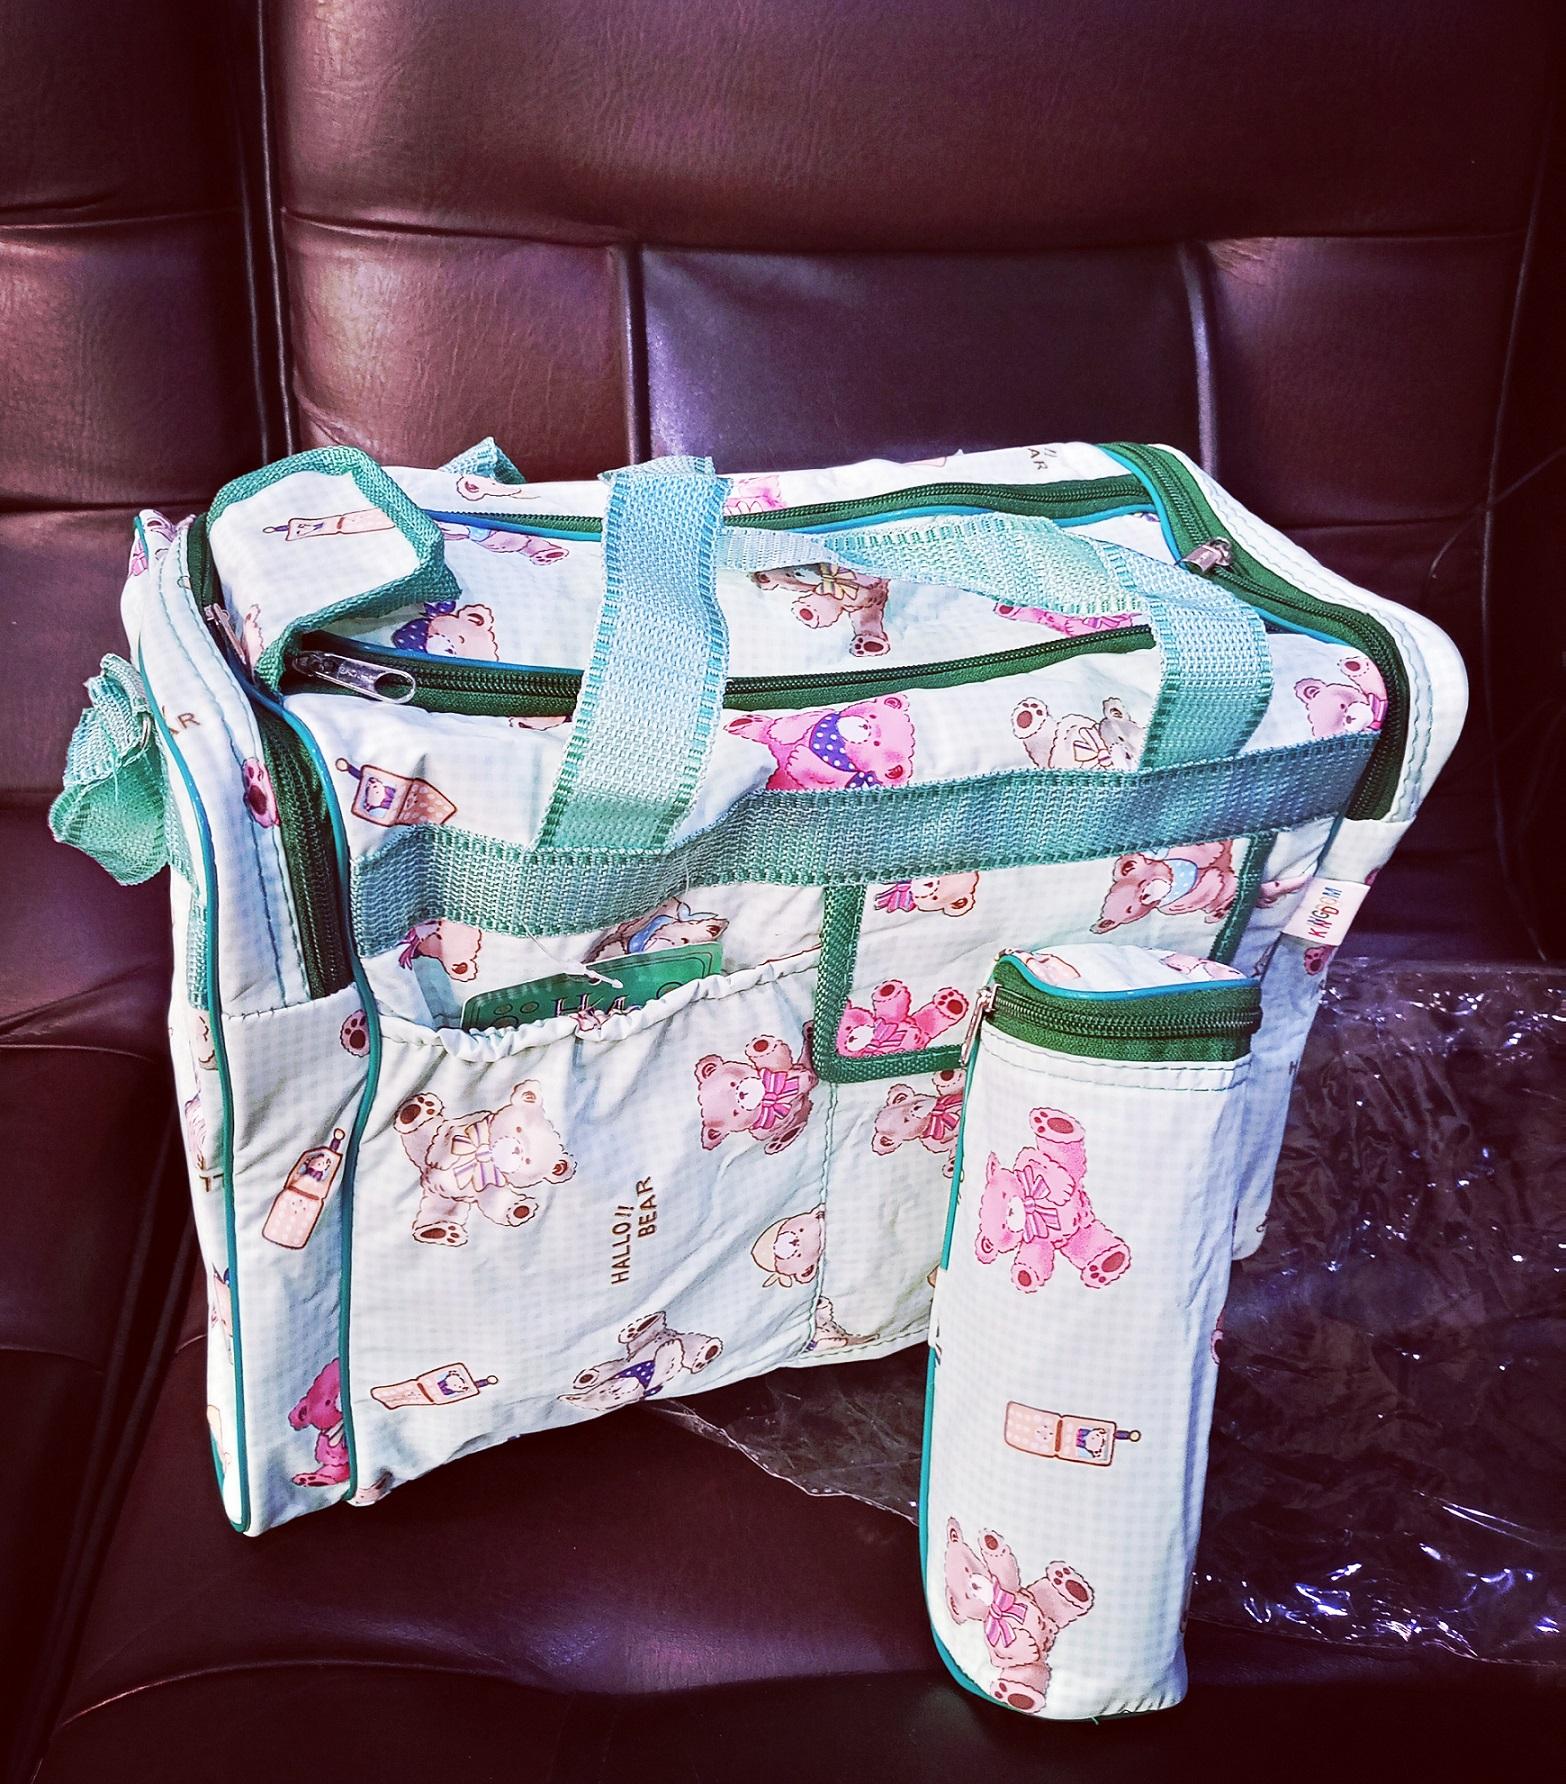 Baby Bag For Diaper & Accessories Hospital Bag 2 piece